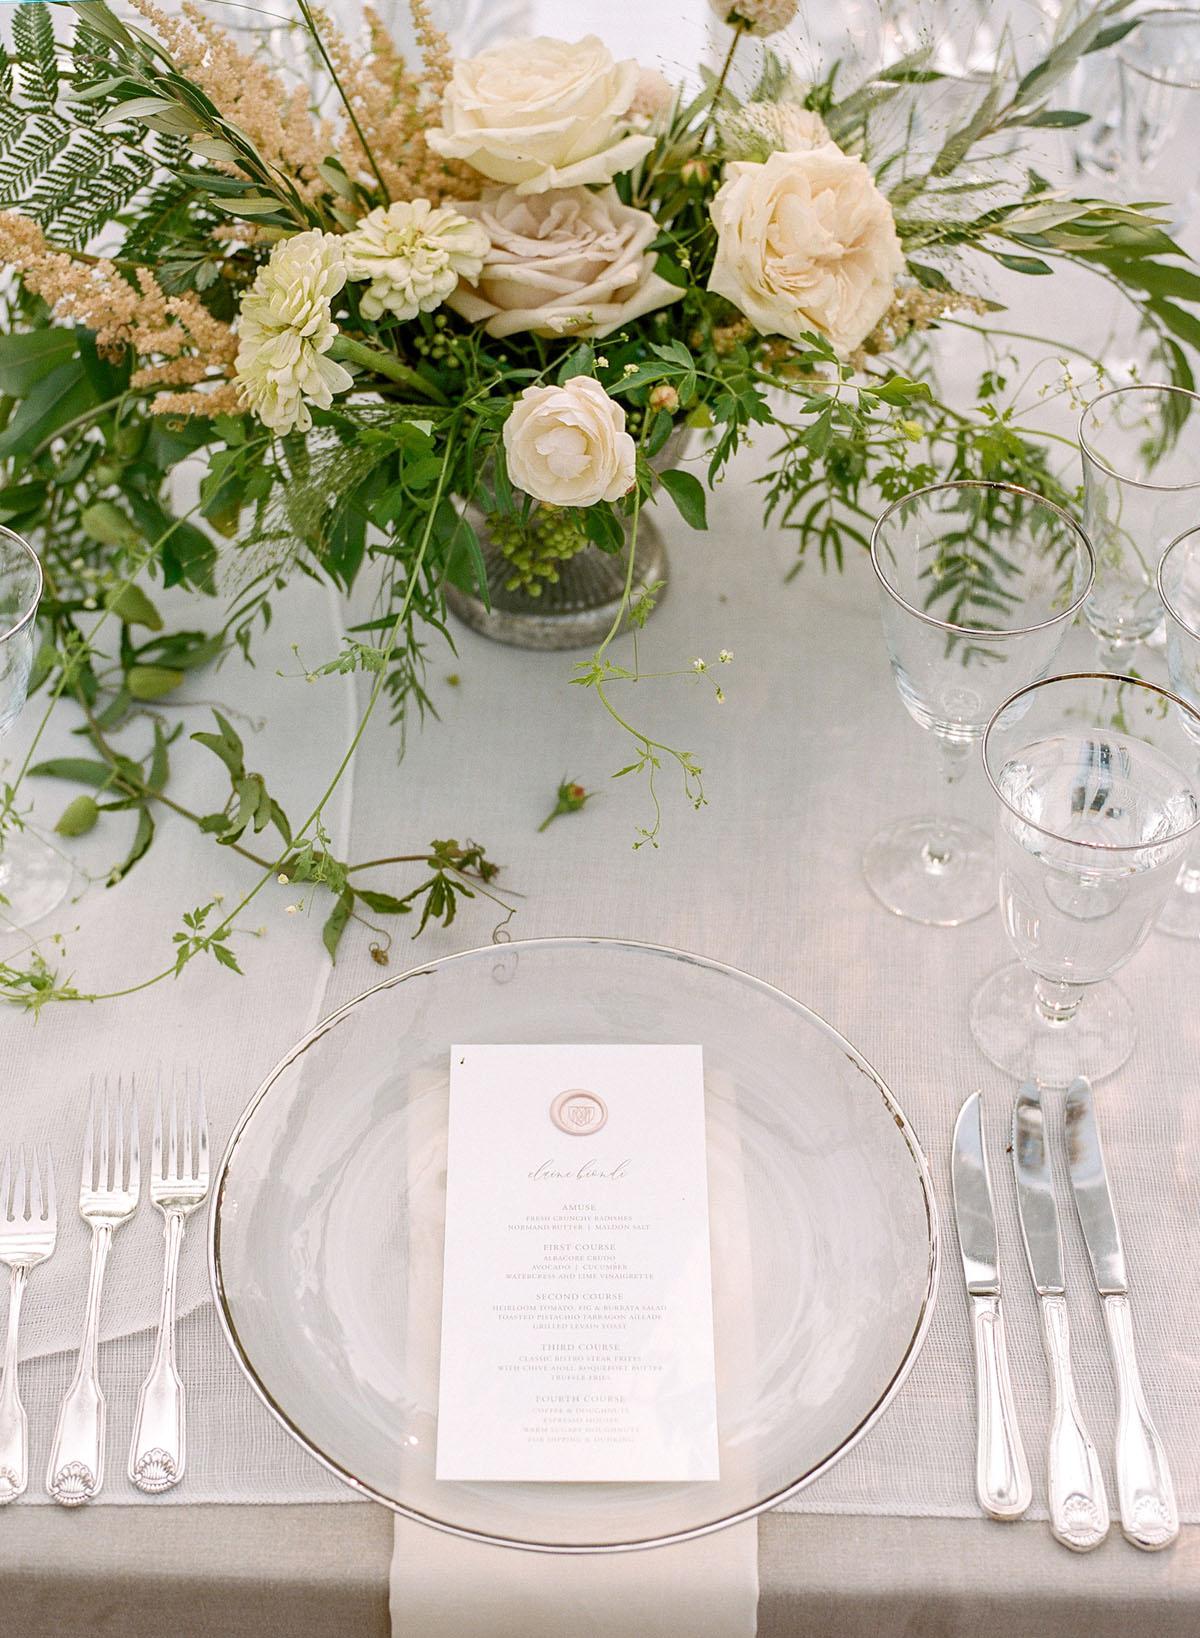 43-alison-events-wedding-design.jpg